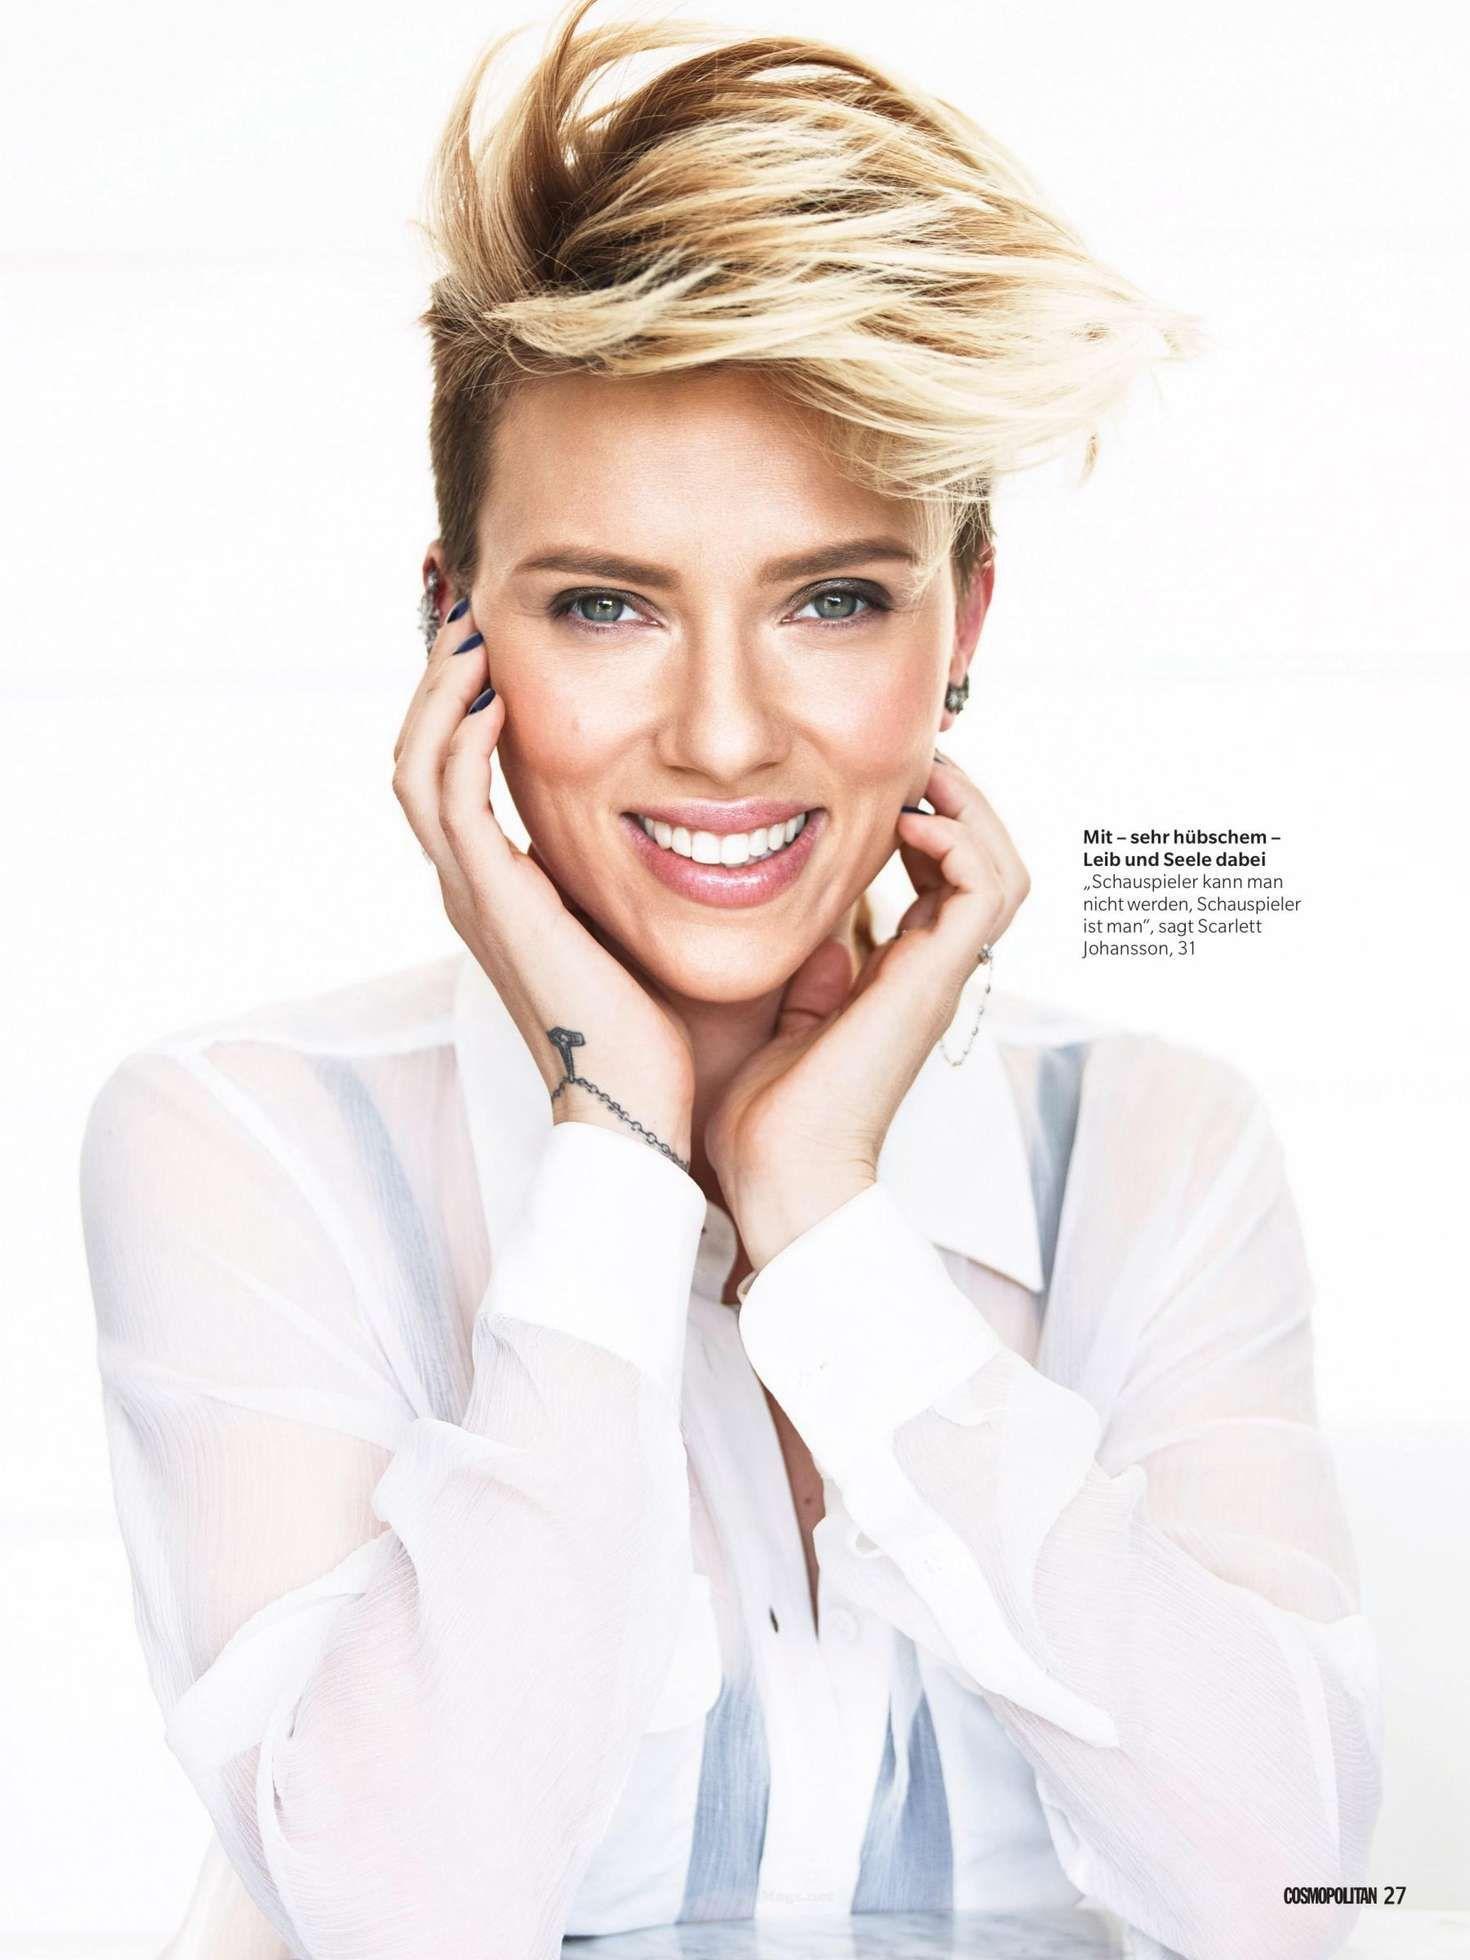 Scarlett Johansson  Undercut pixie  Pinterest  Scarlett Johansson